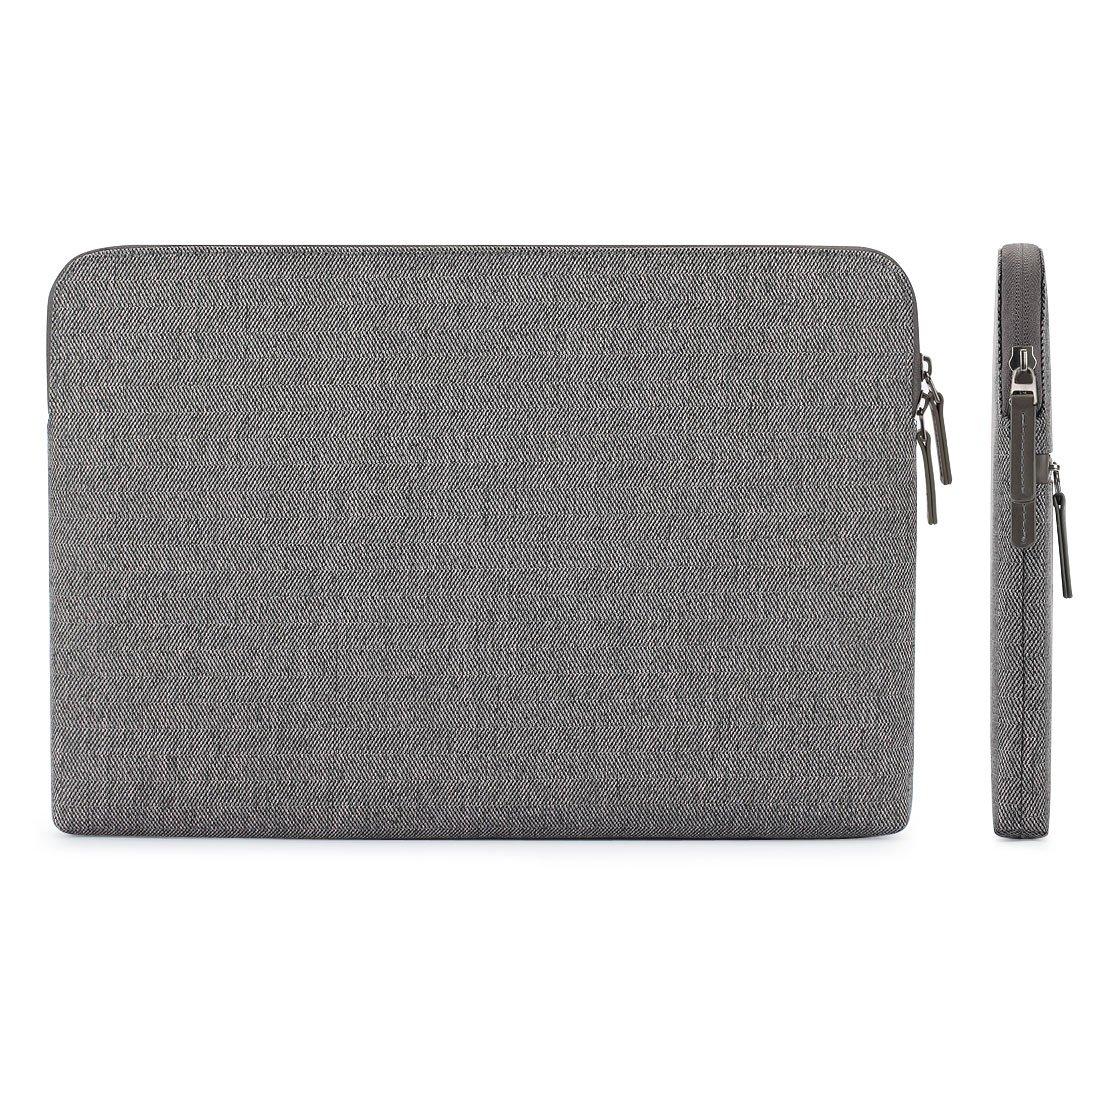 DOMISO 13-13,3 Pulgadas Funda Bolsa Protectora para Ordenador Portátil/Tablet / Netbook/Apple MacBook Pro Retina/ASUS / HP/Lenovo / Primux/Toshiba ...